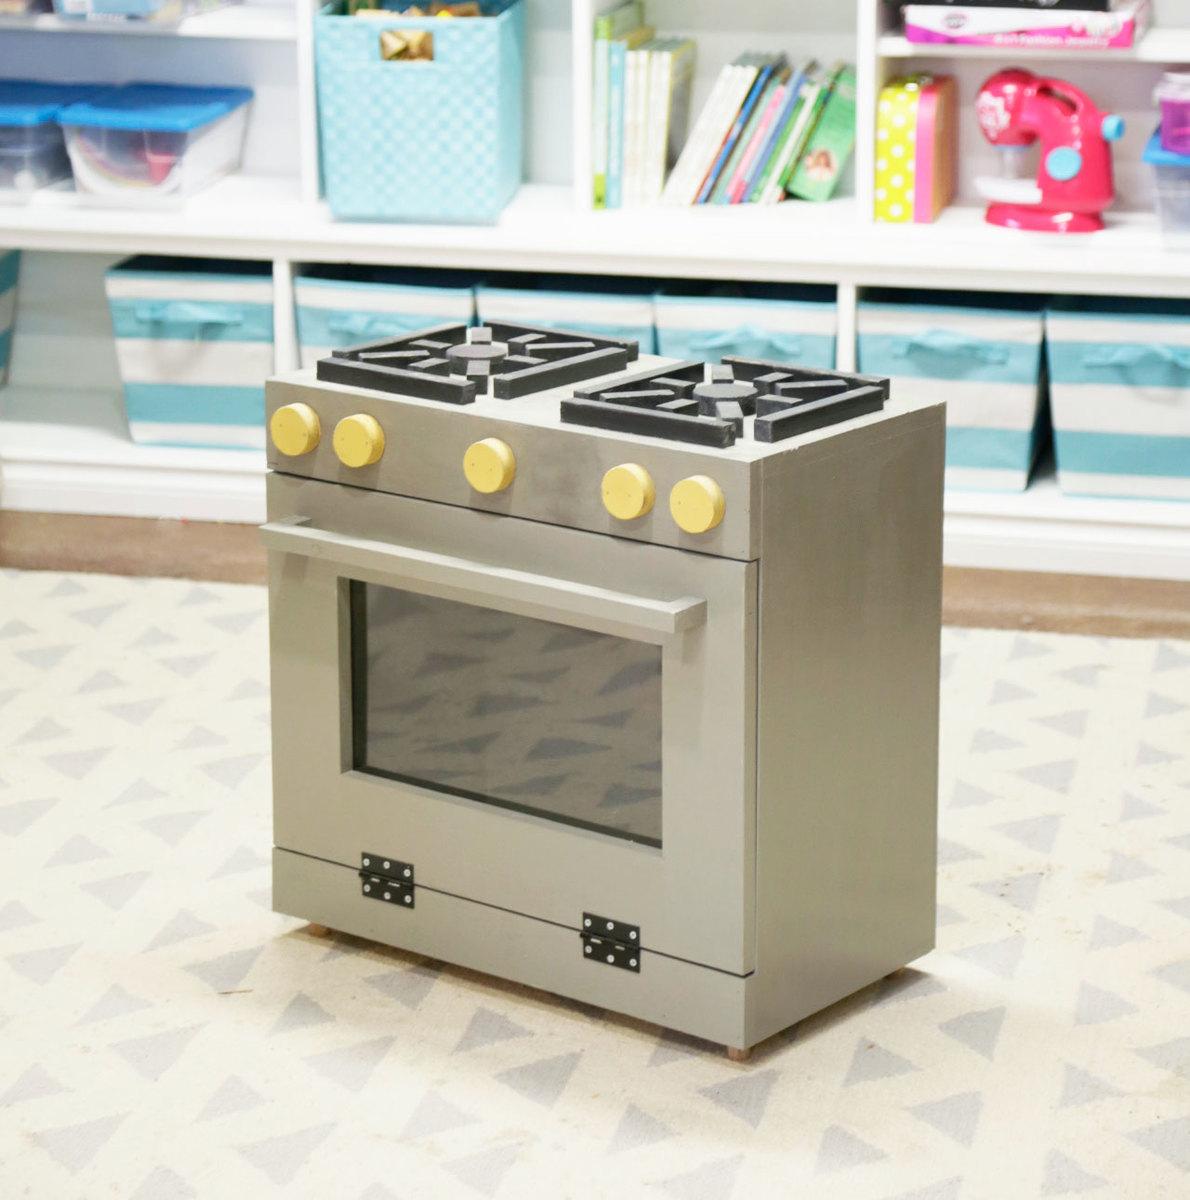 Foodie Play Kitchen Stove Wood Toy | Ana White